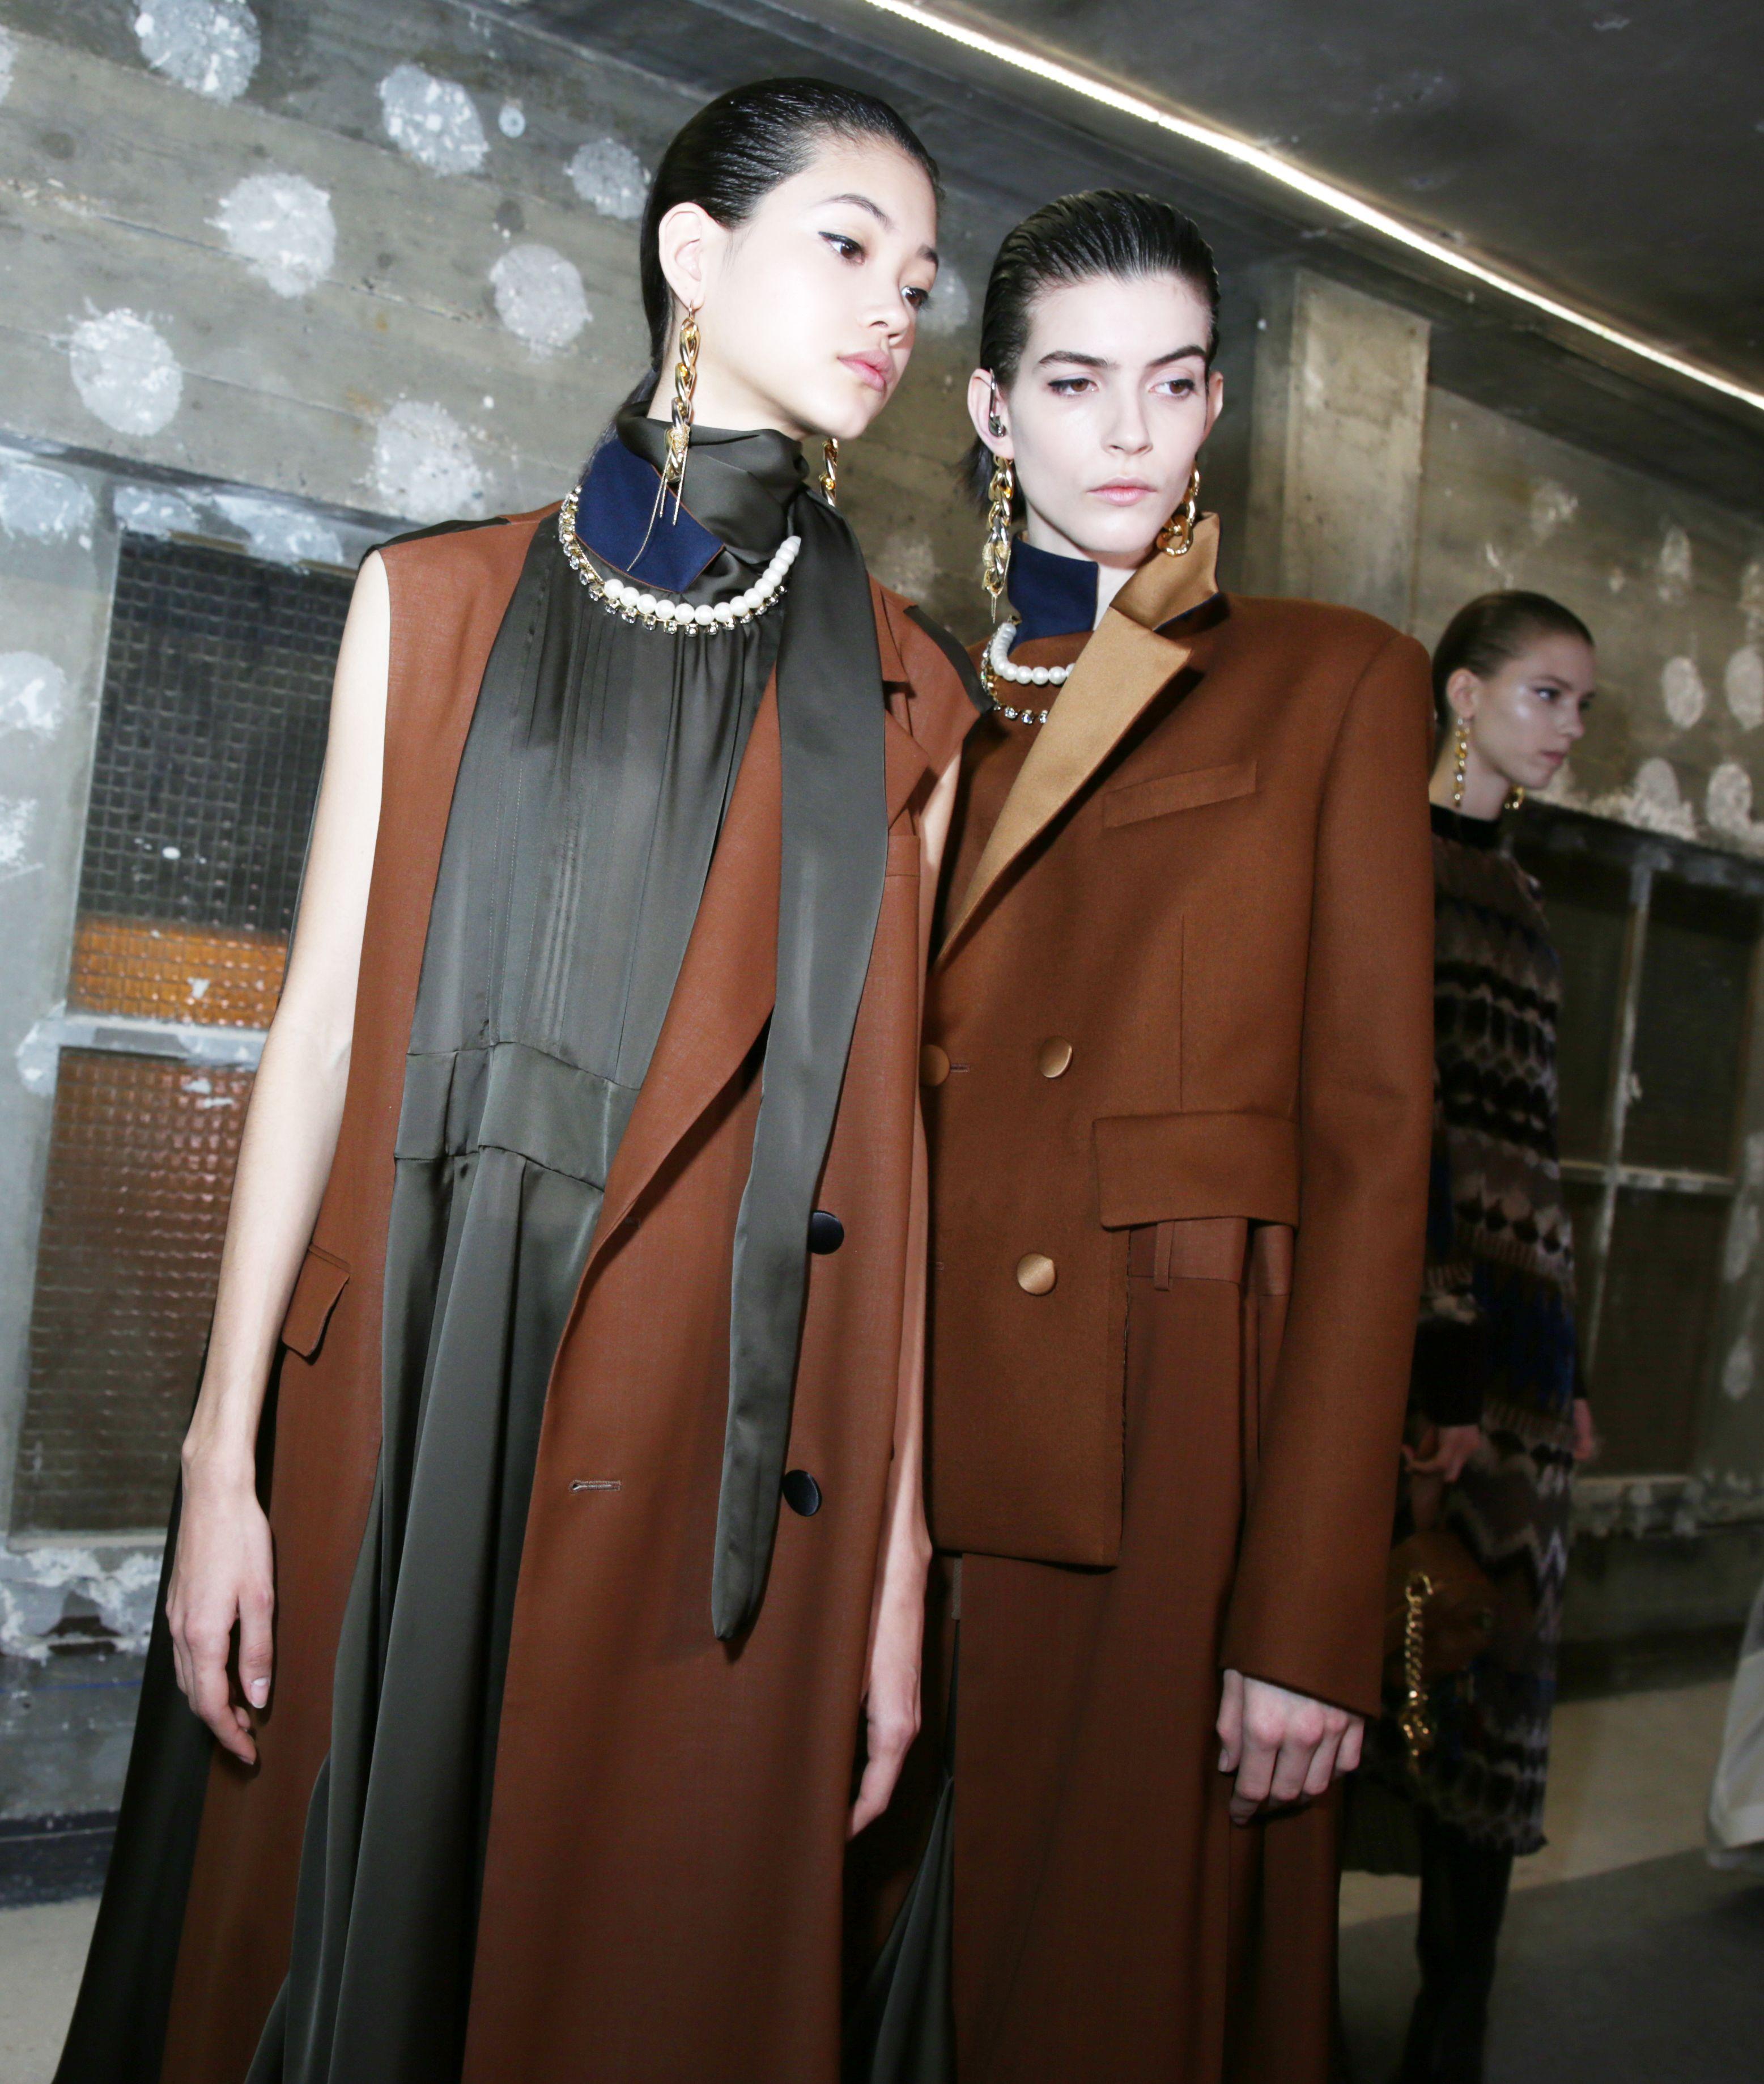 Models backstageSacai show, Backstage, Fall Winter 2020, Paris Fashion Week, France - 02 Mar 2020